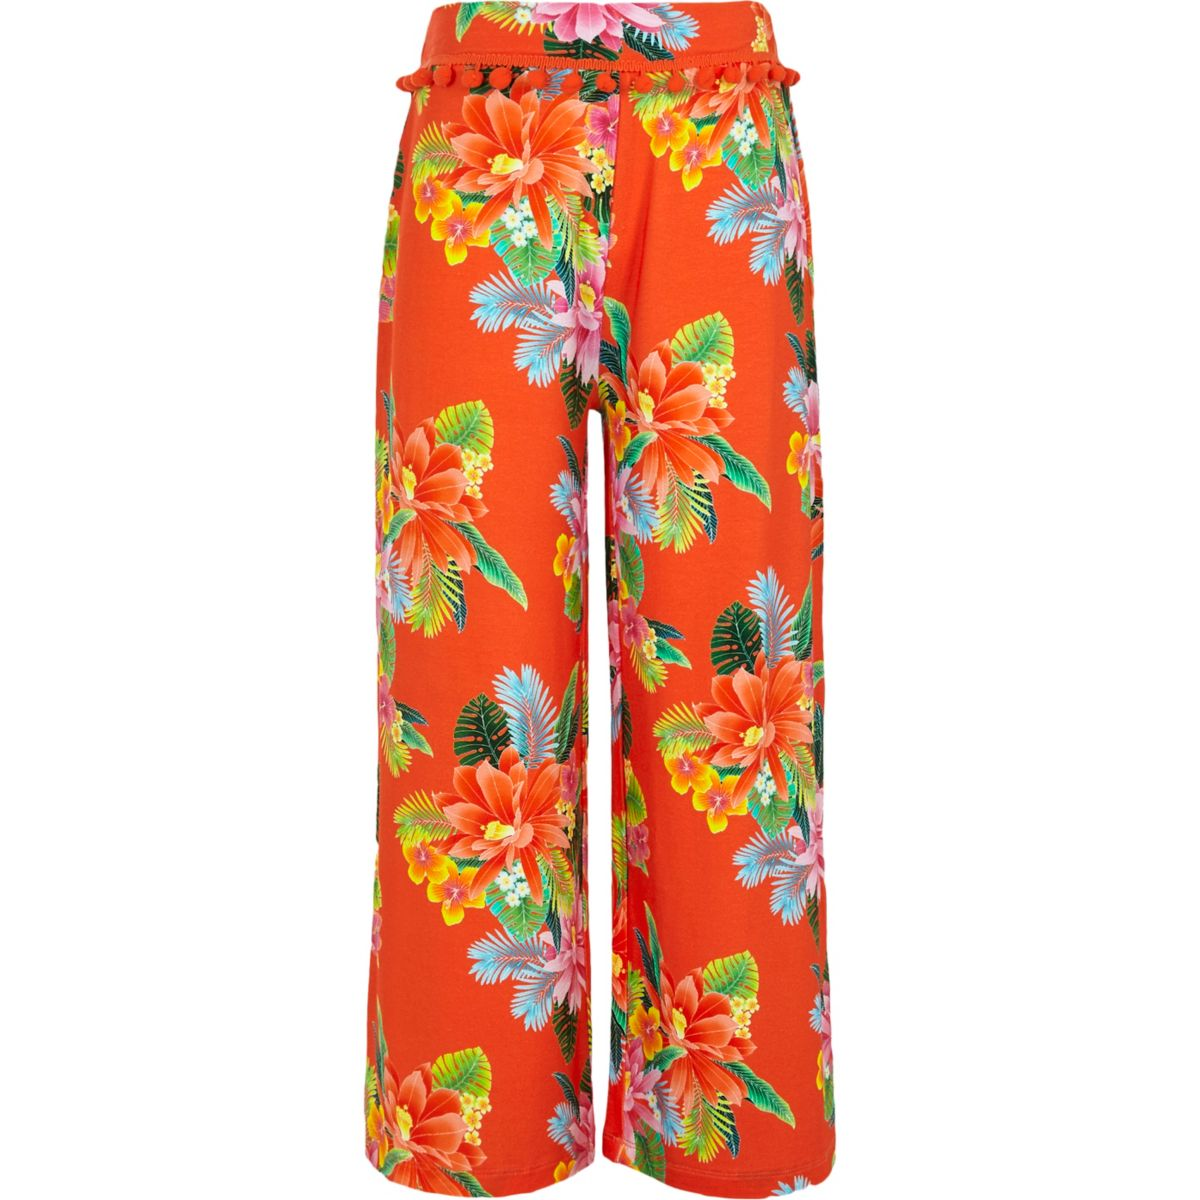 Girls orange floral wide leg pants